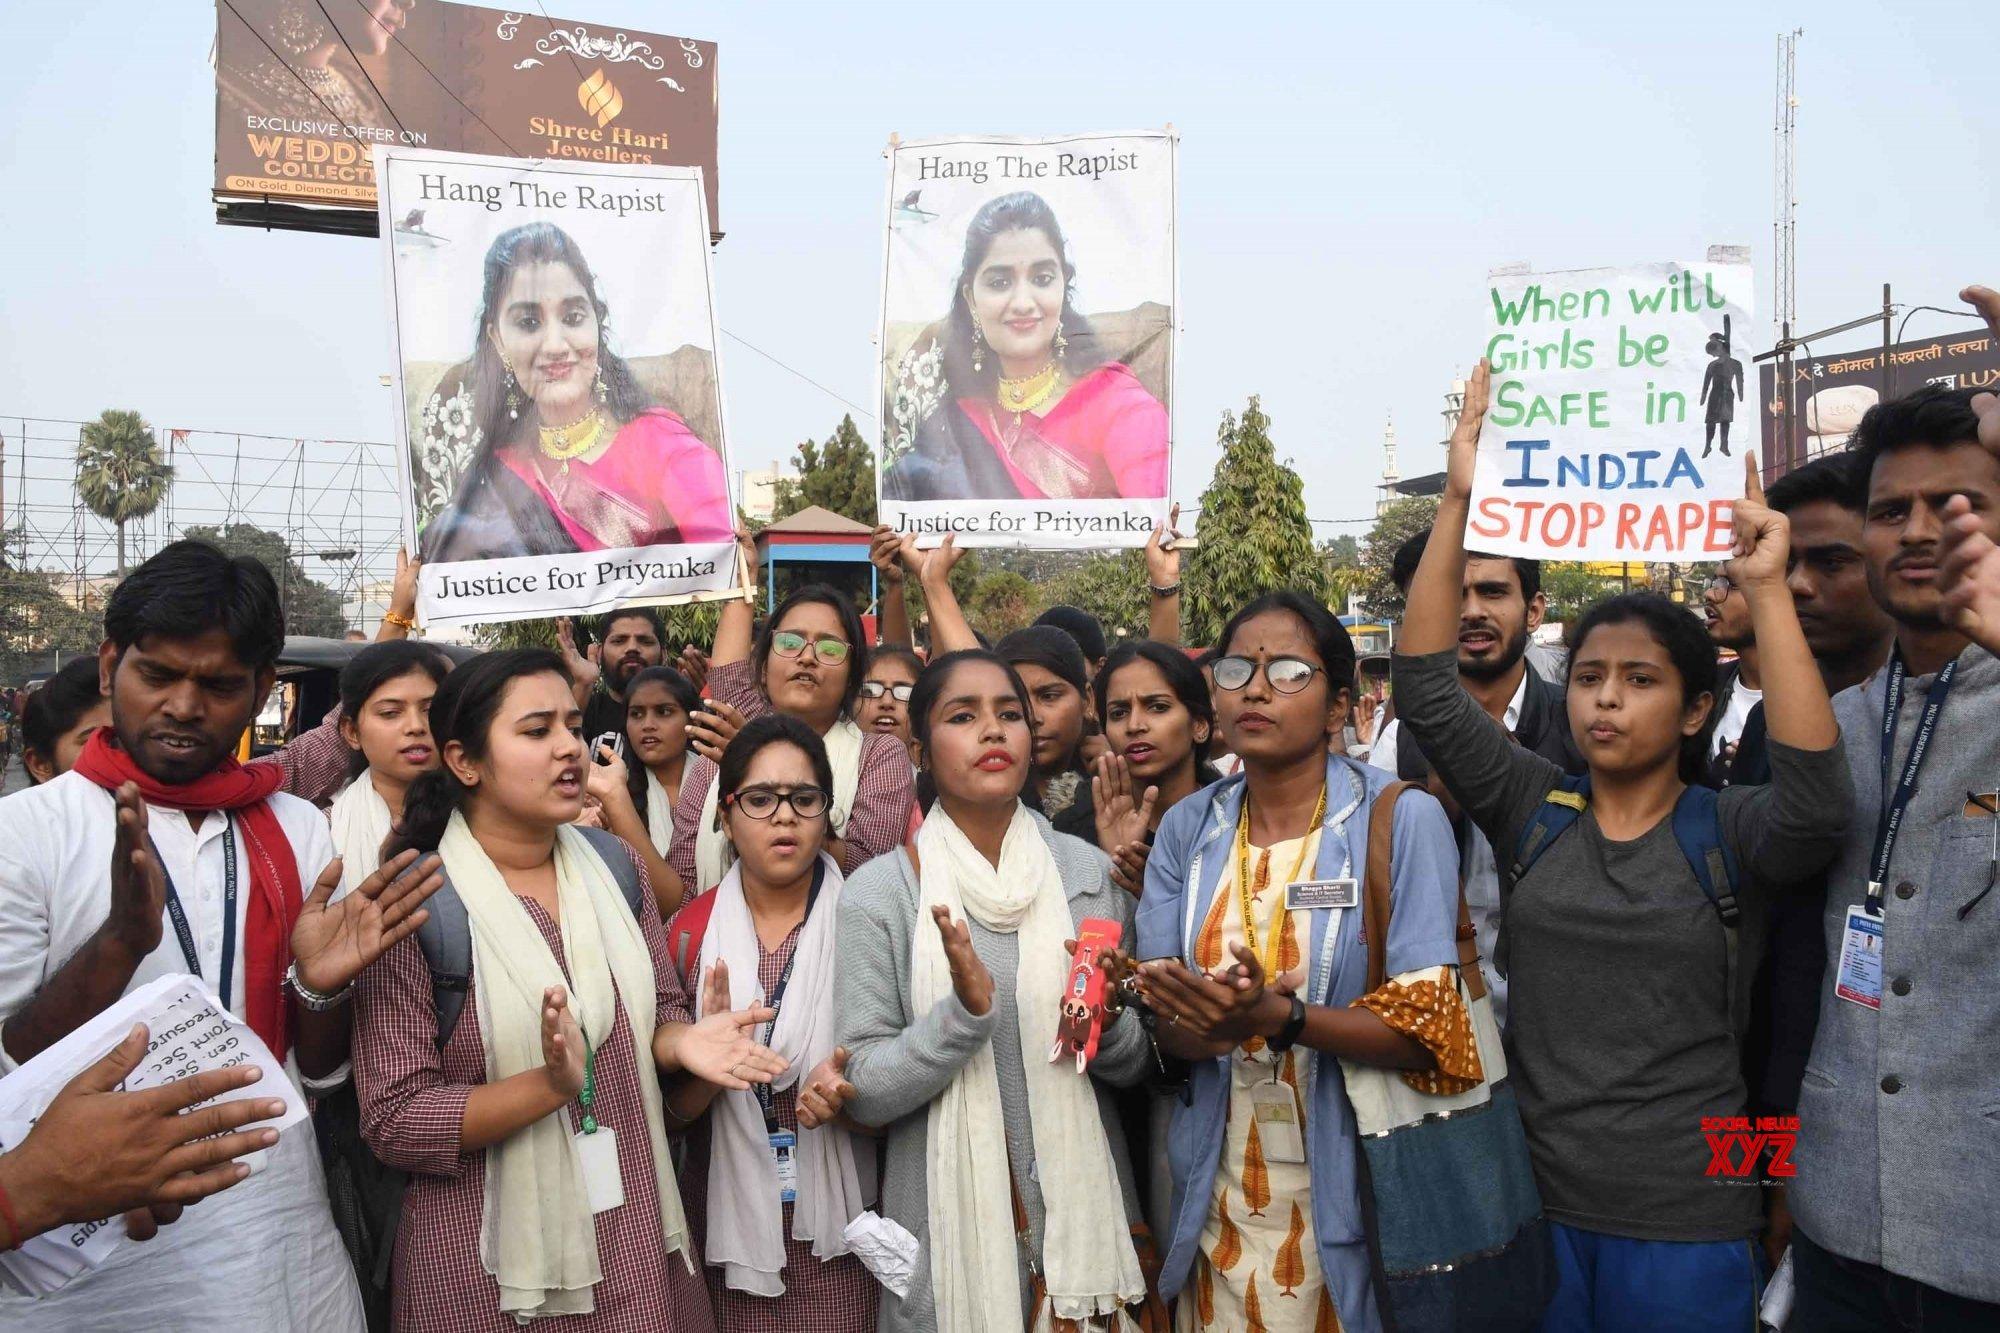 Patna: Samta Yuva Manch's demonstration against Hyd gang rape - murder #Gallery